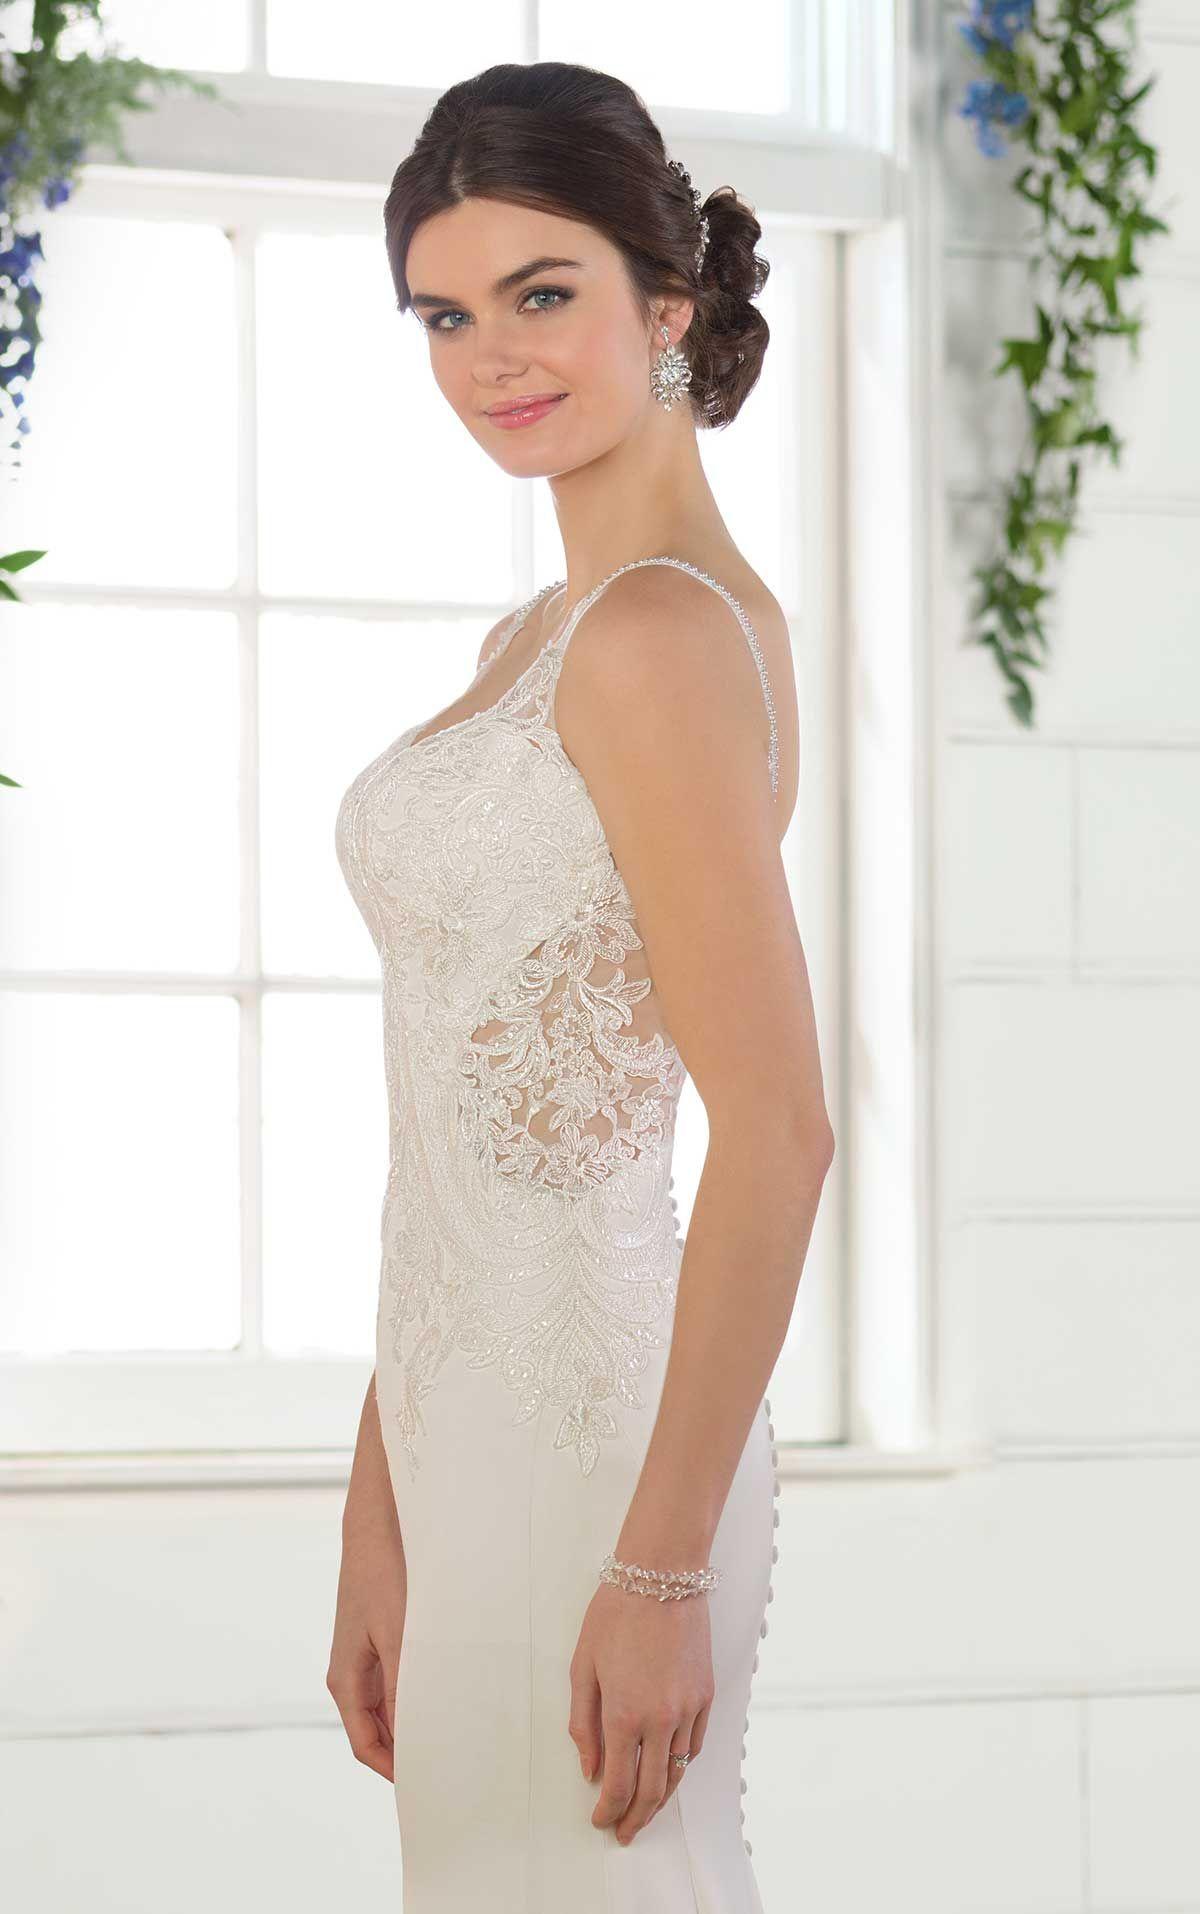 271452053dfa Dreamy Chic Essense of Australia Wedding Dresses Fall 2018 Collection   weddingdresses   bridalgowns   wedding   bridal   bride